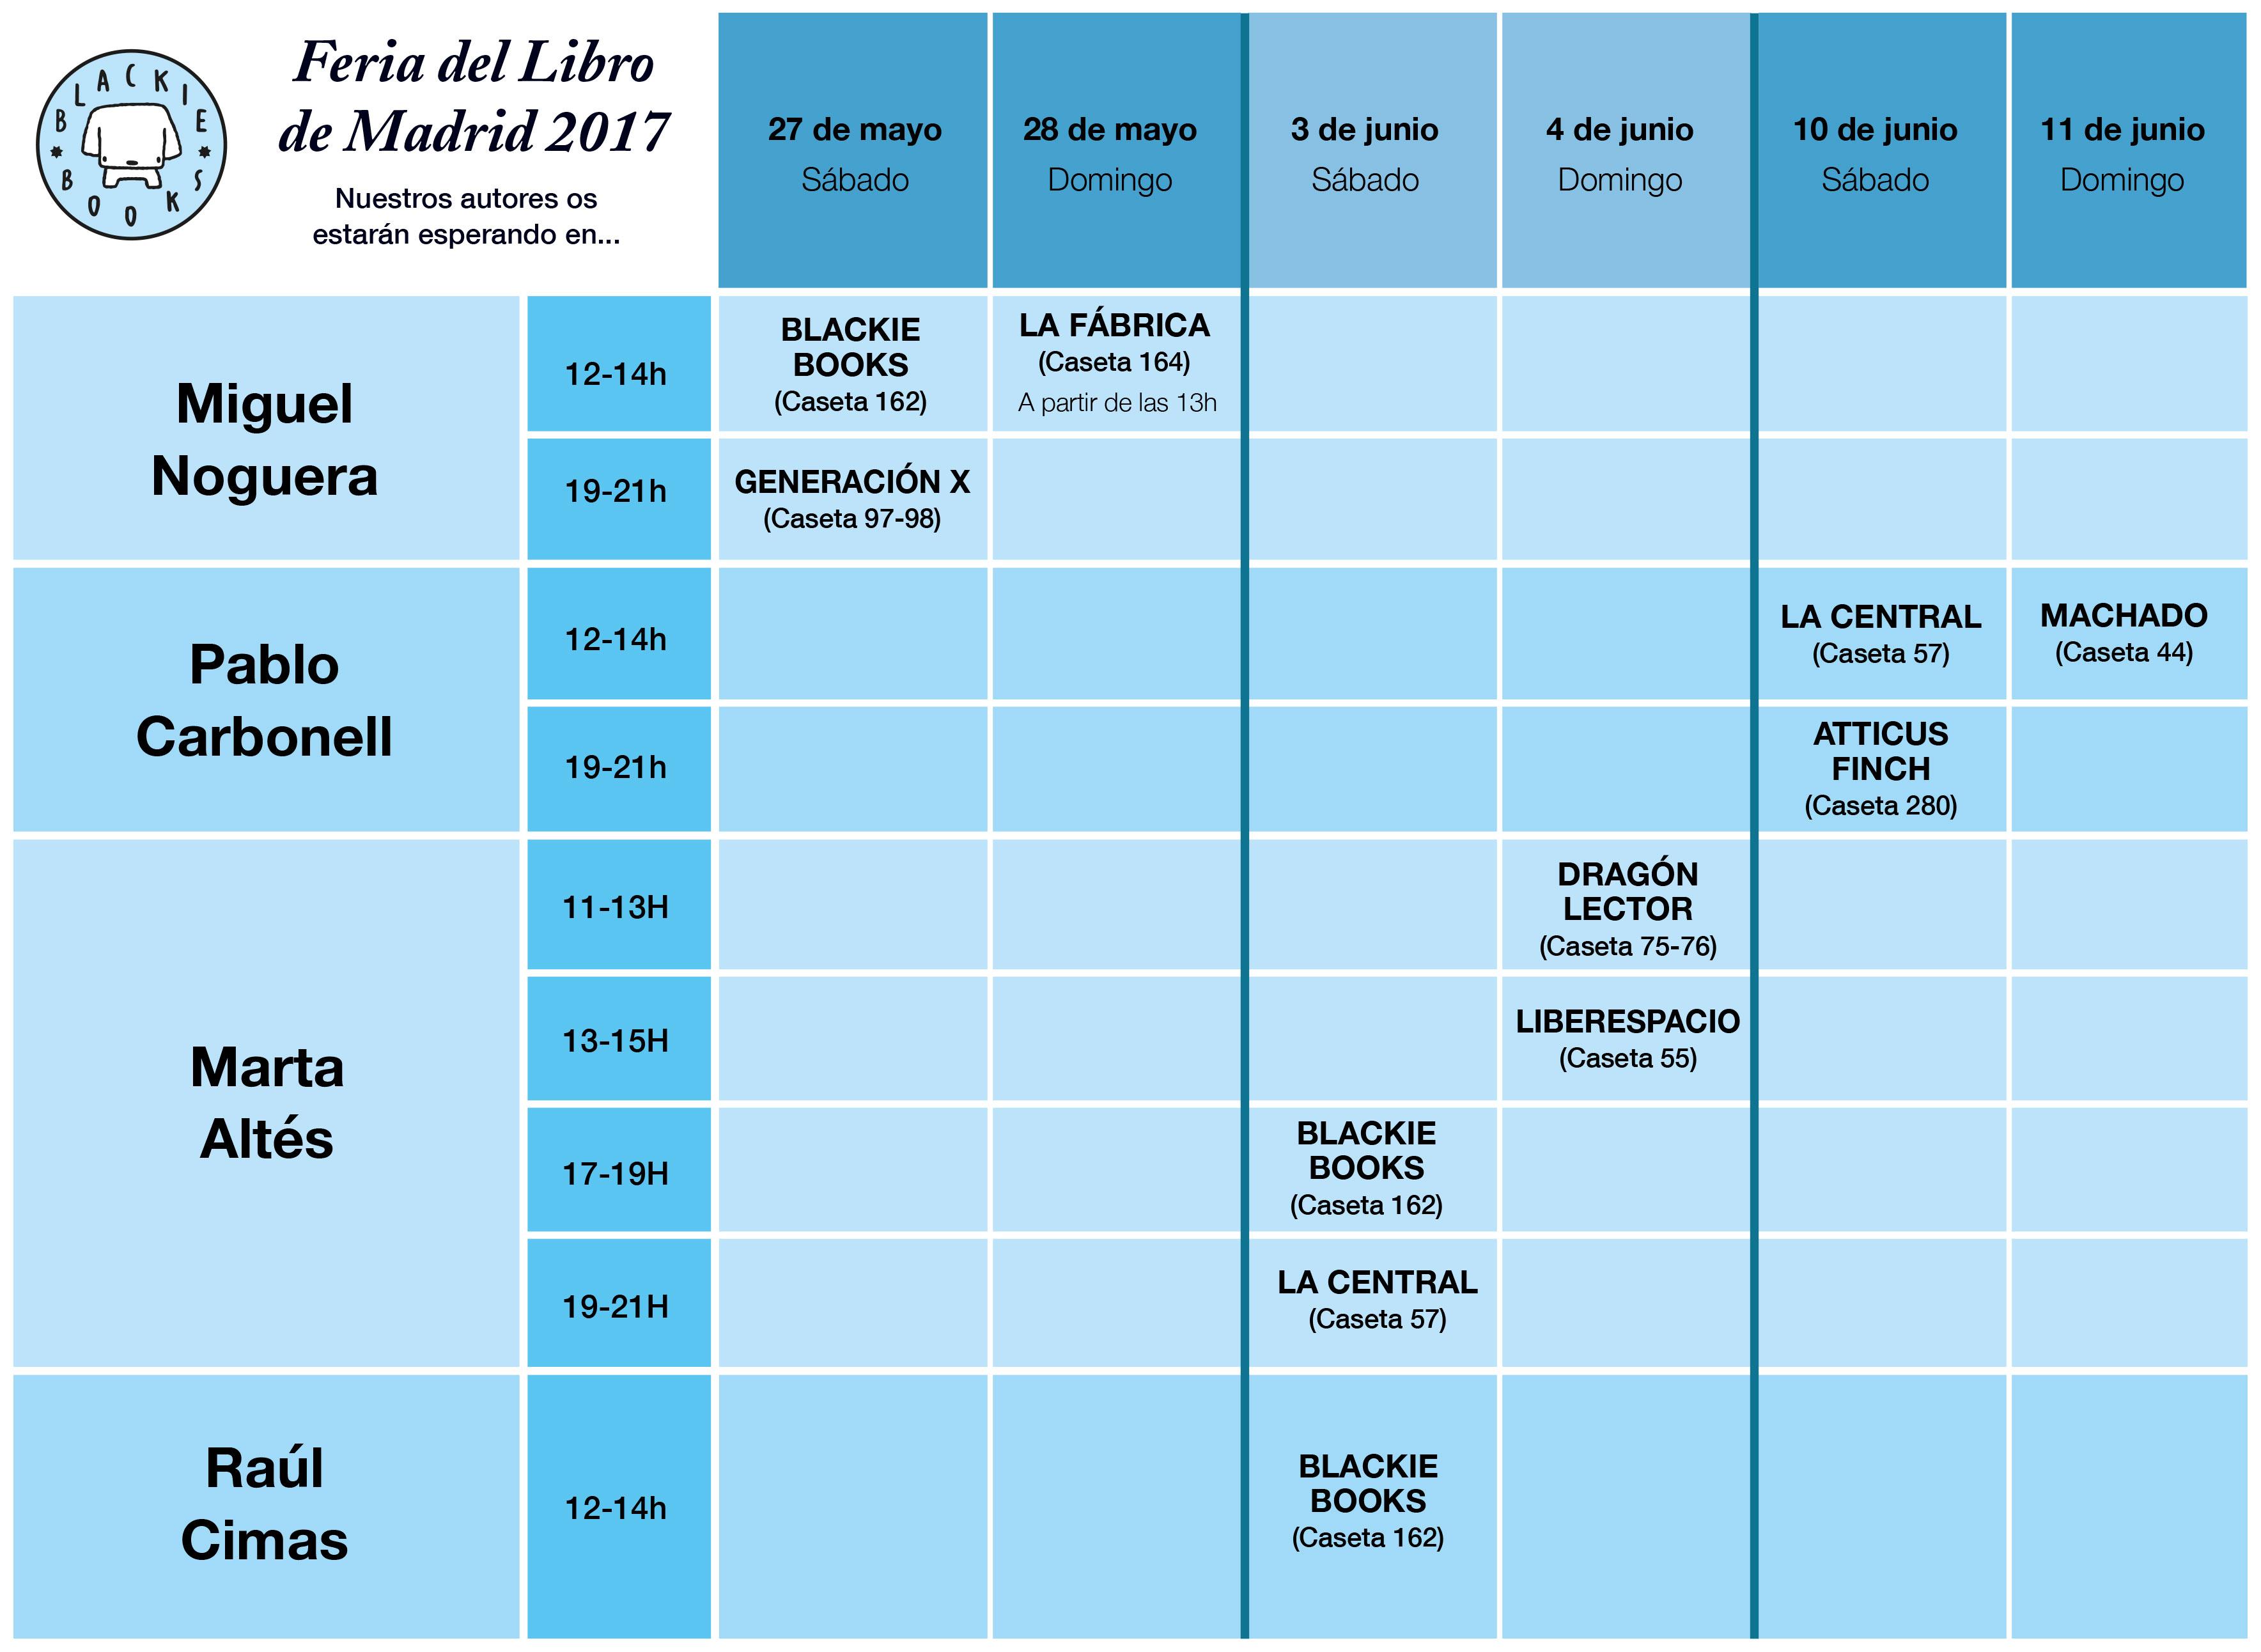 Horarios-firmas_FLM2017_BB